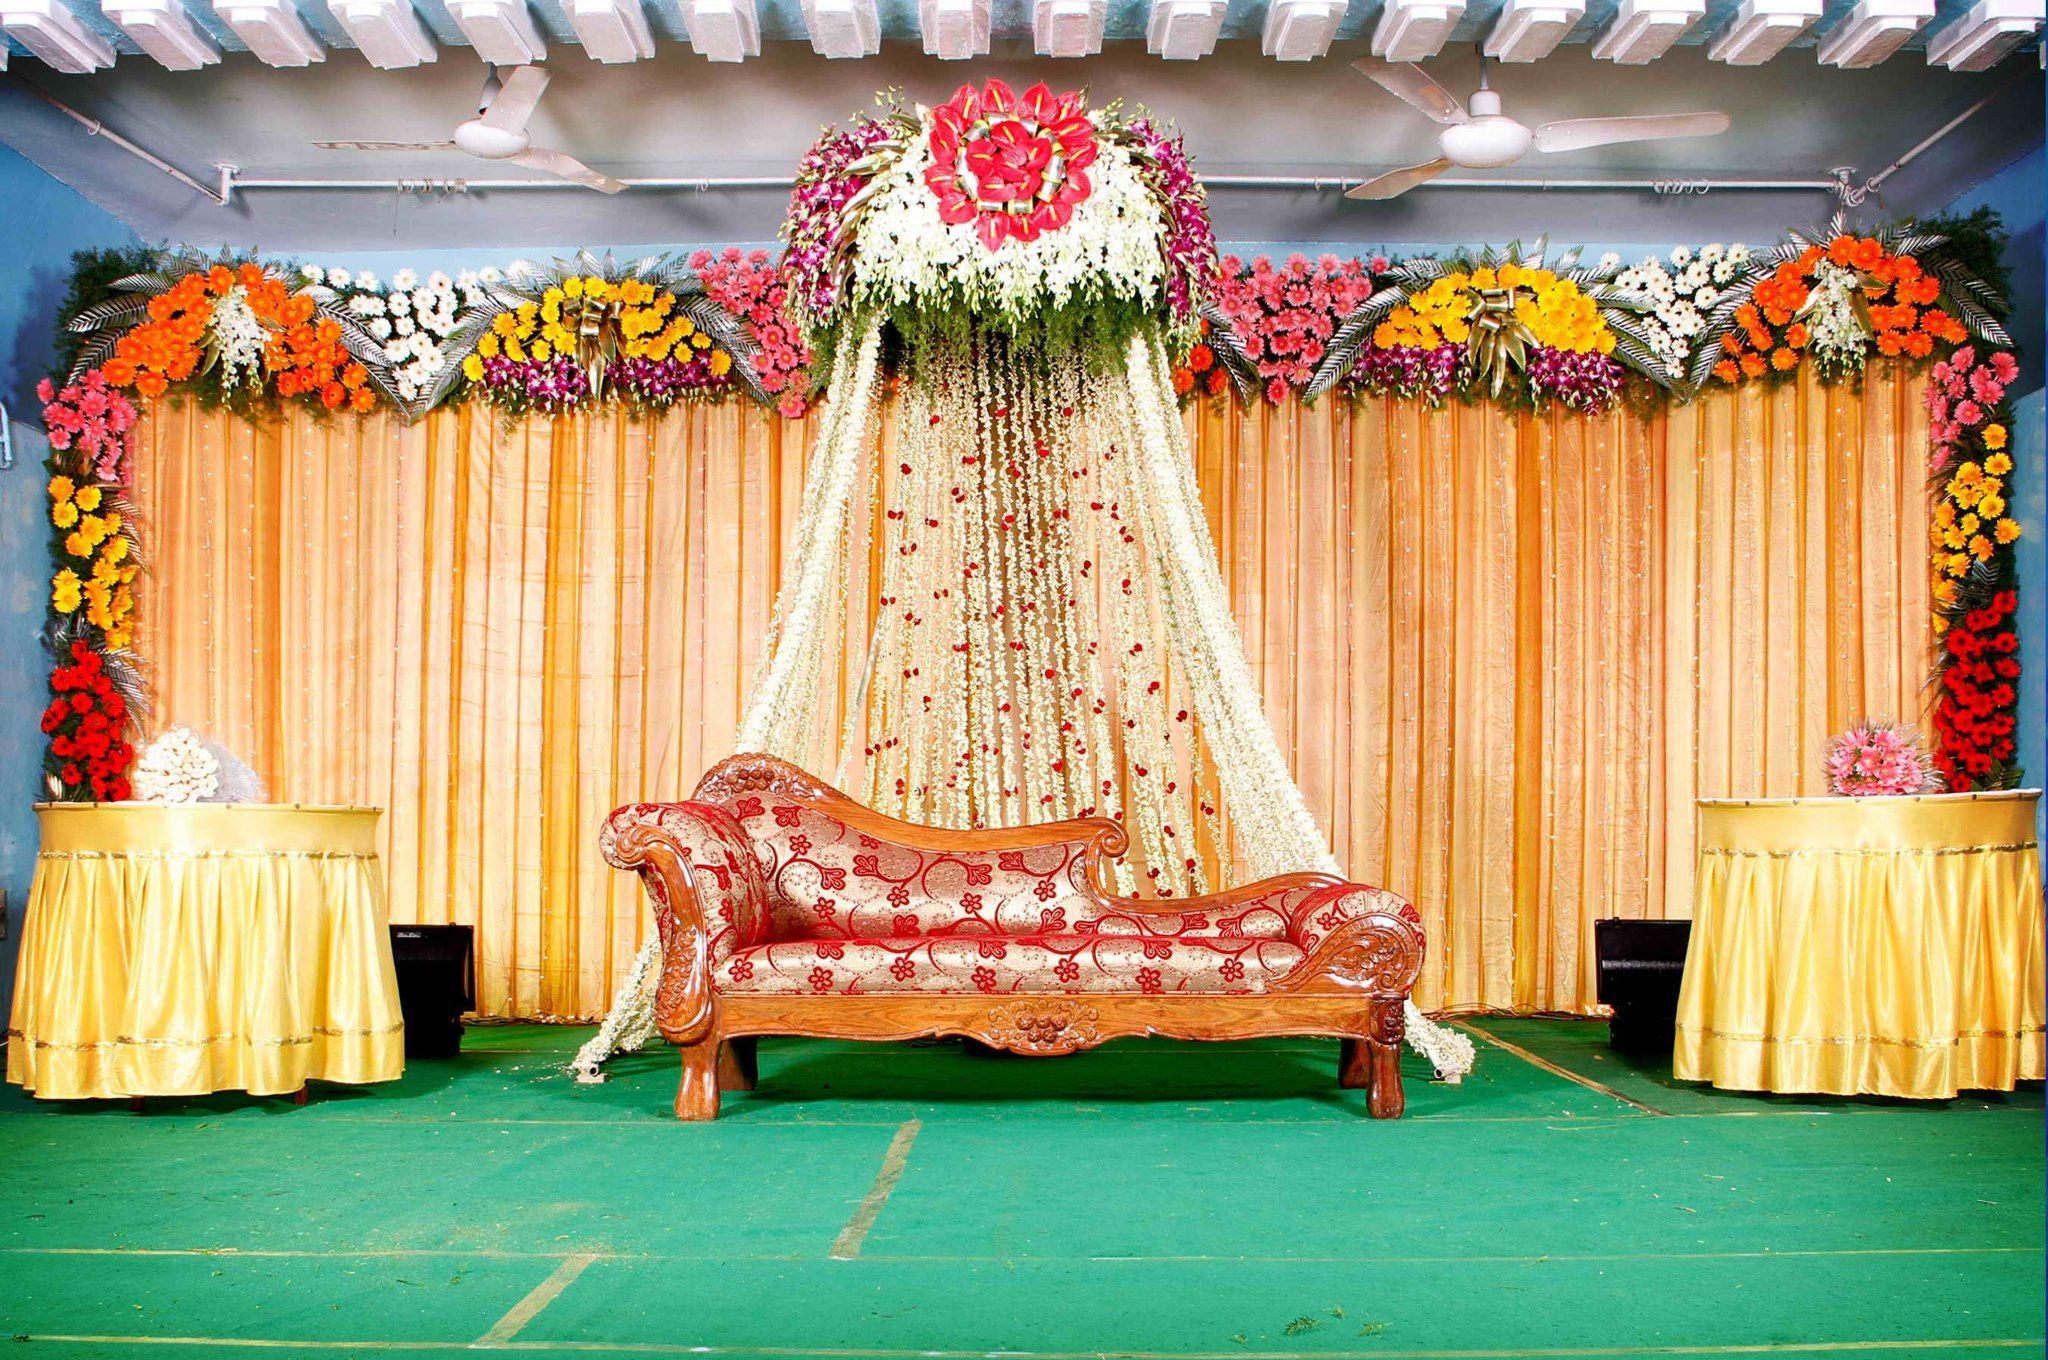 3best pakistani wedding stage decoration 2014 - Stage Decorations